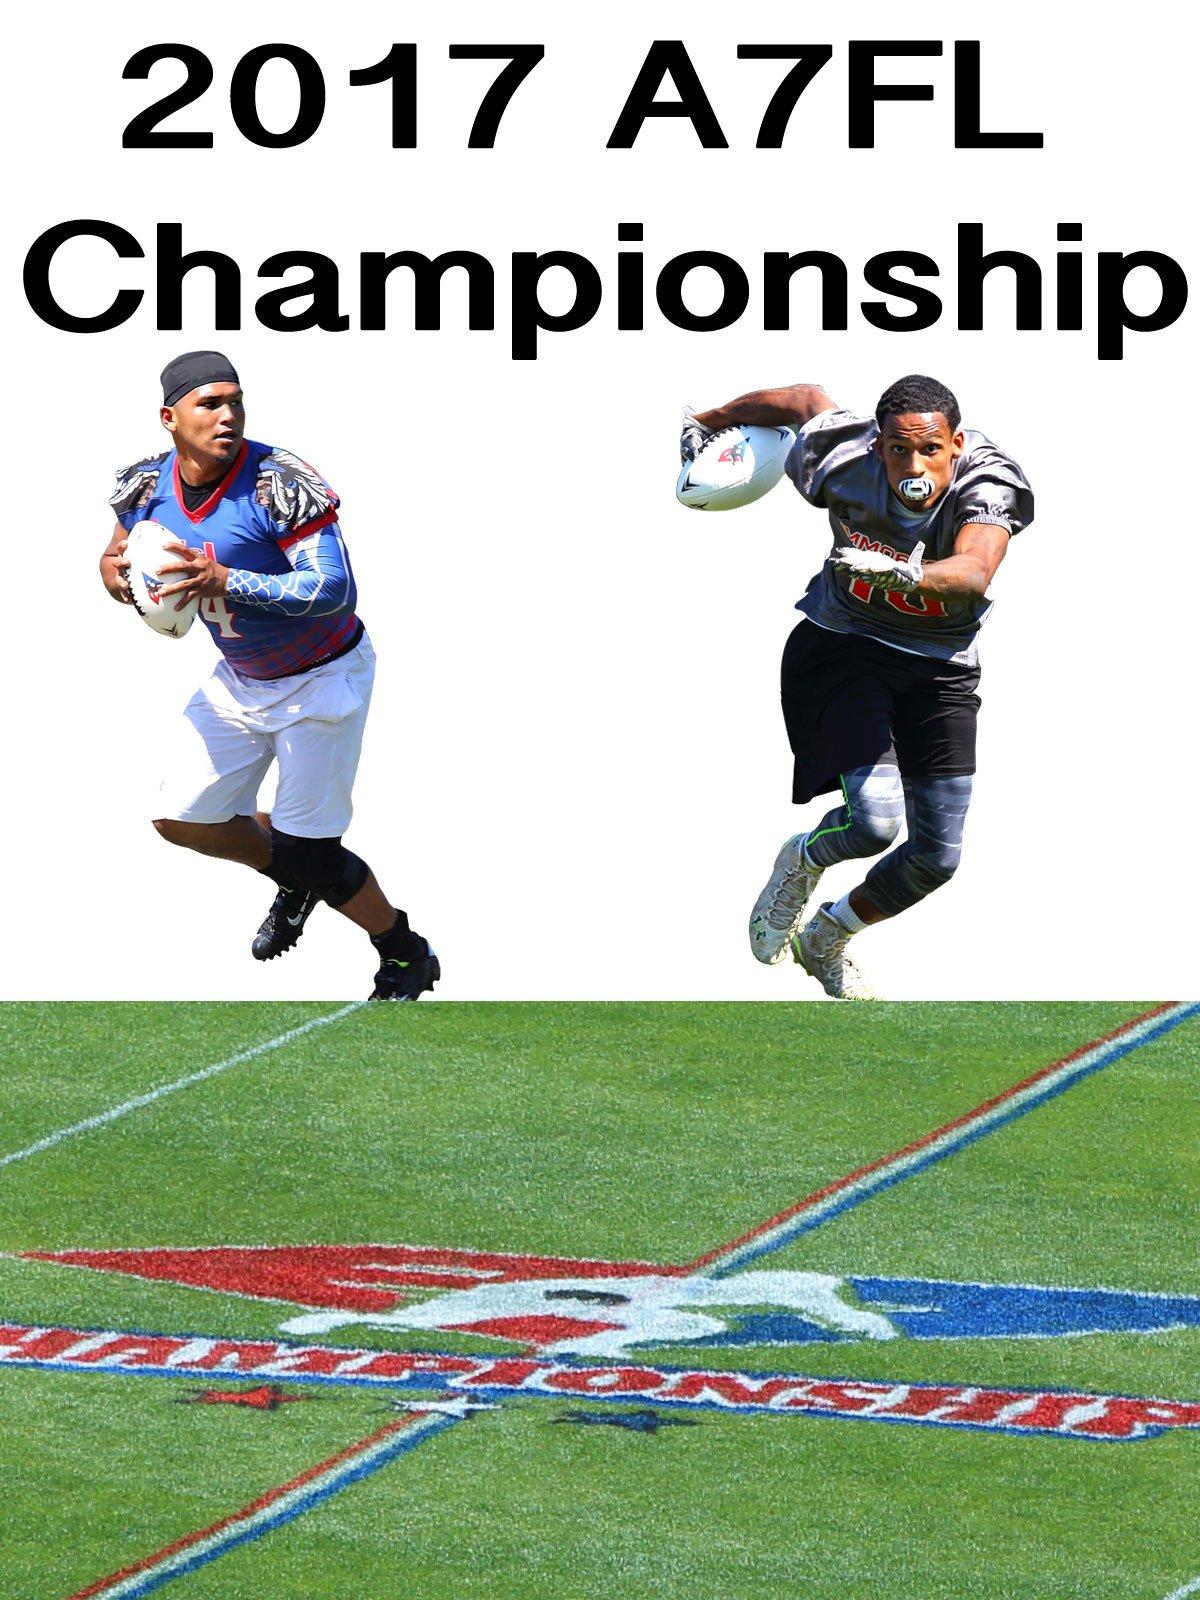 2017 A7FL Championship